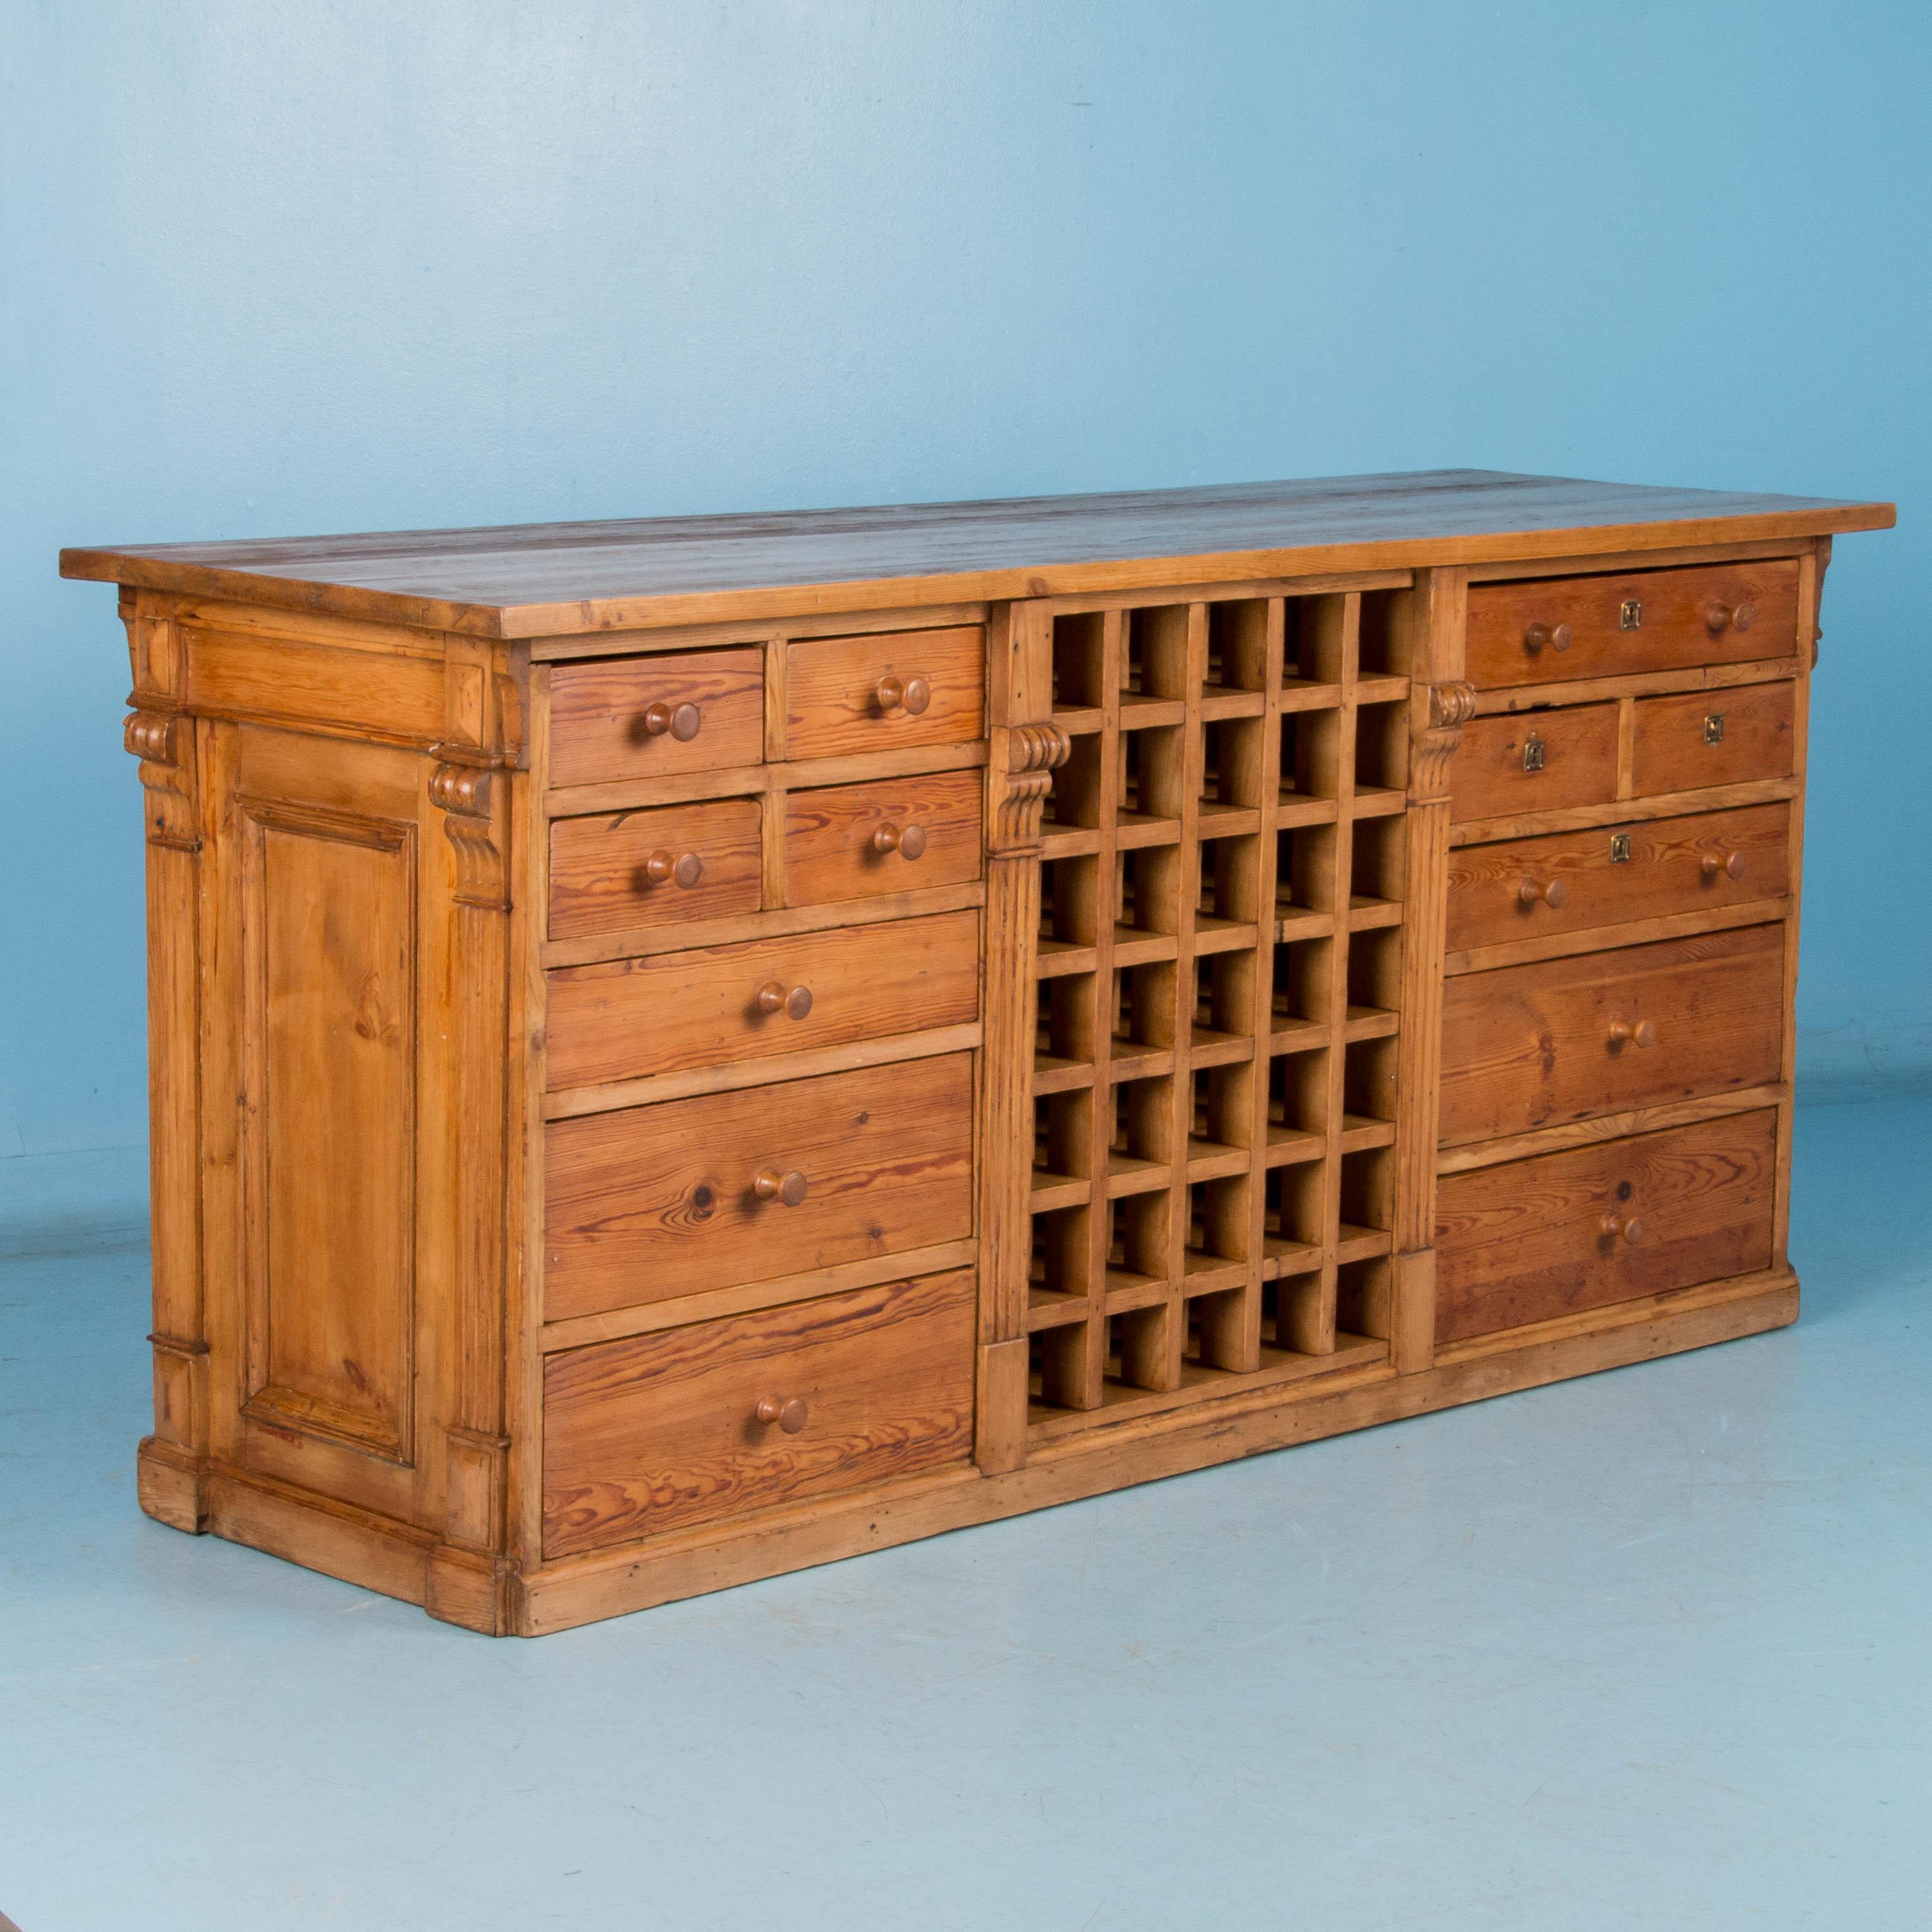 Scandinavian Antiques Antique Furniture for Sale